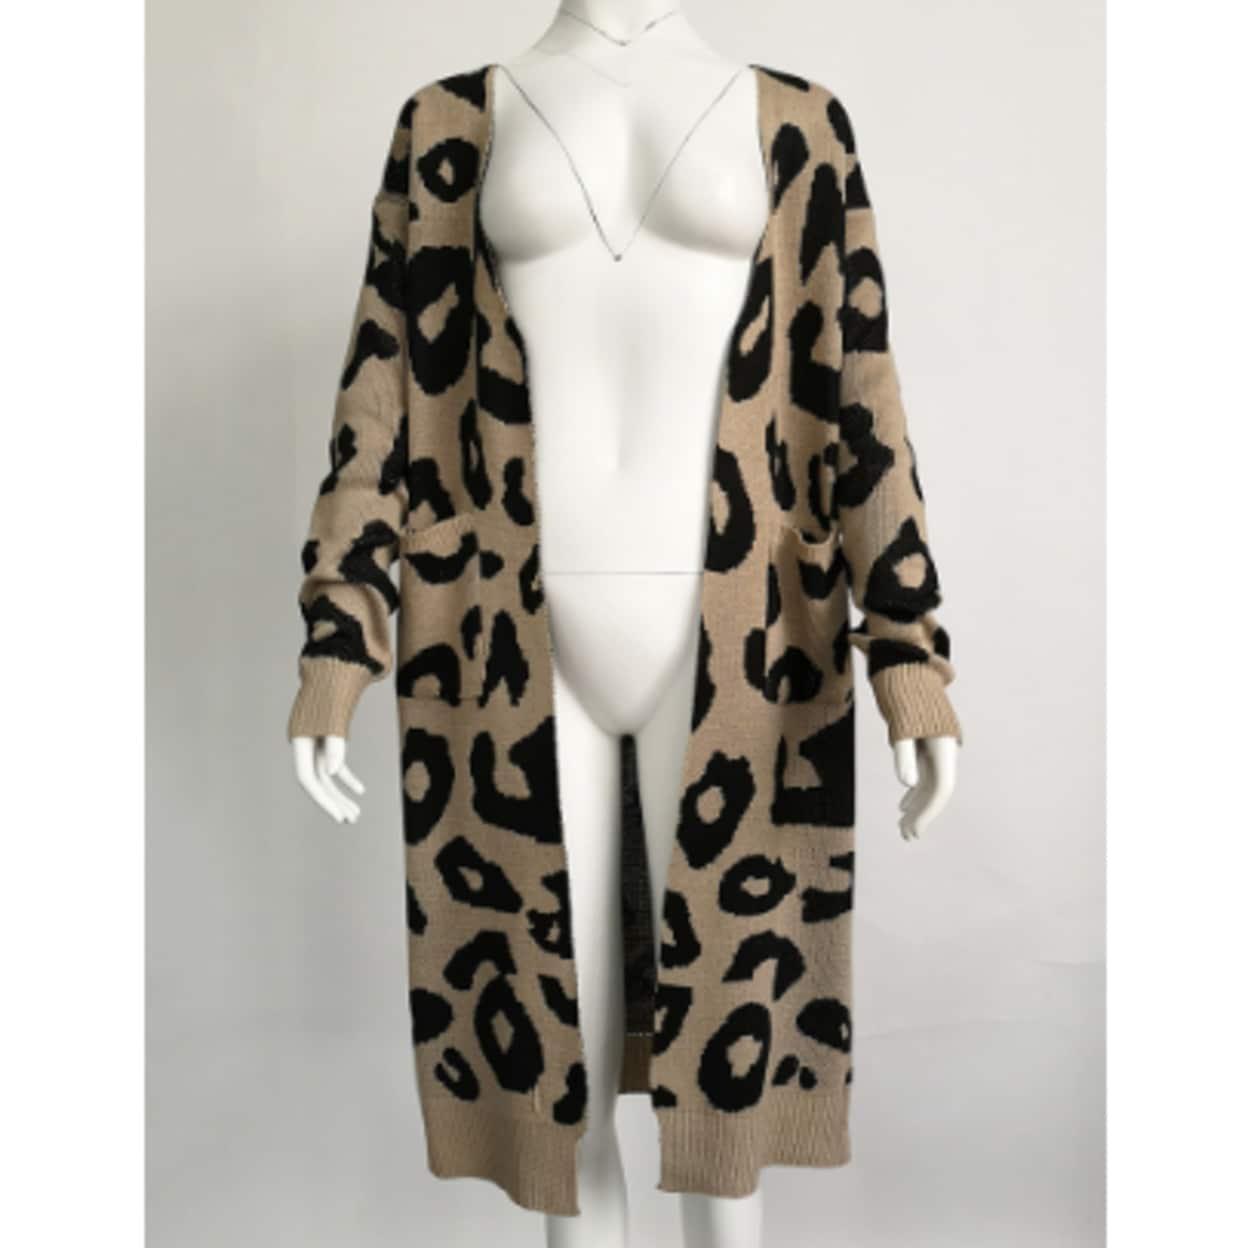 Cardigan Plus Size Coat Jacket Long Sleeve Camo Women/'s Leopard Open Front